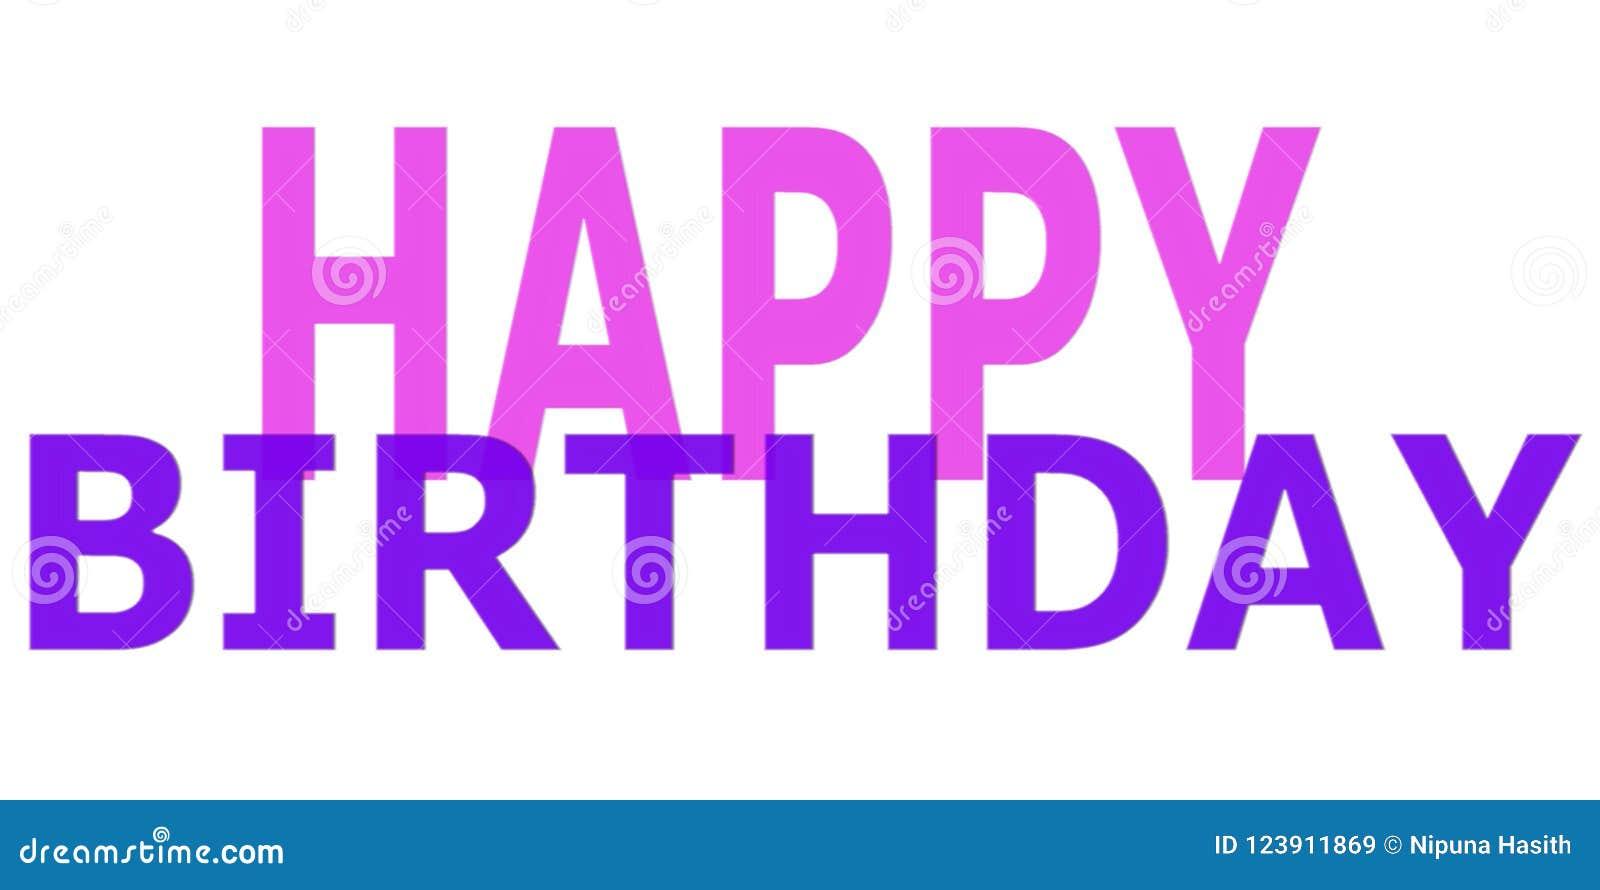 Simple Happy Birthday Wish Image